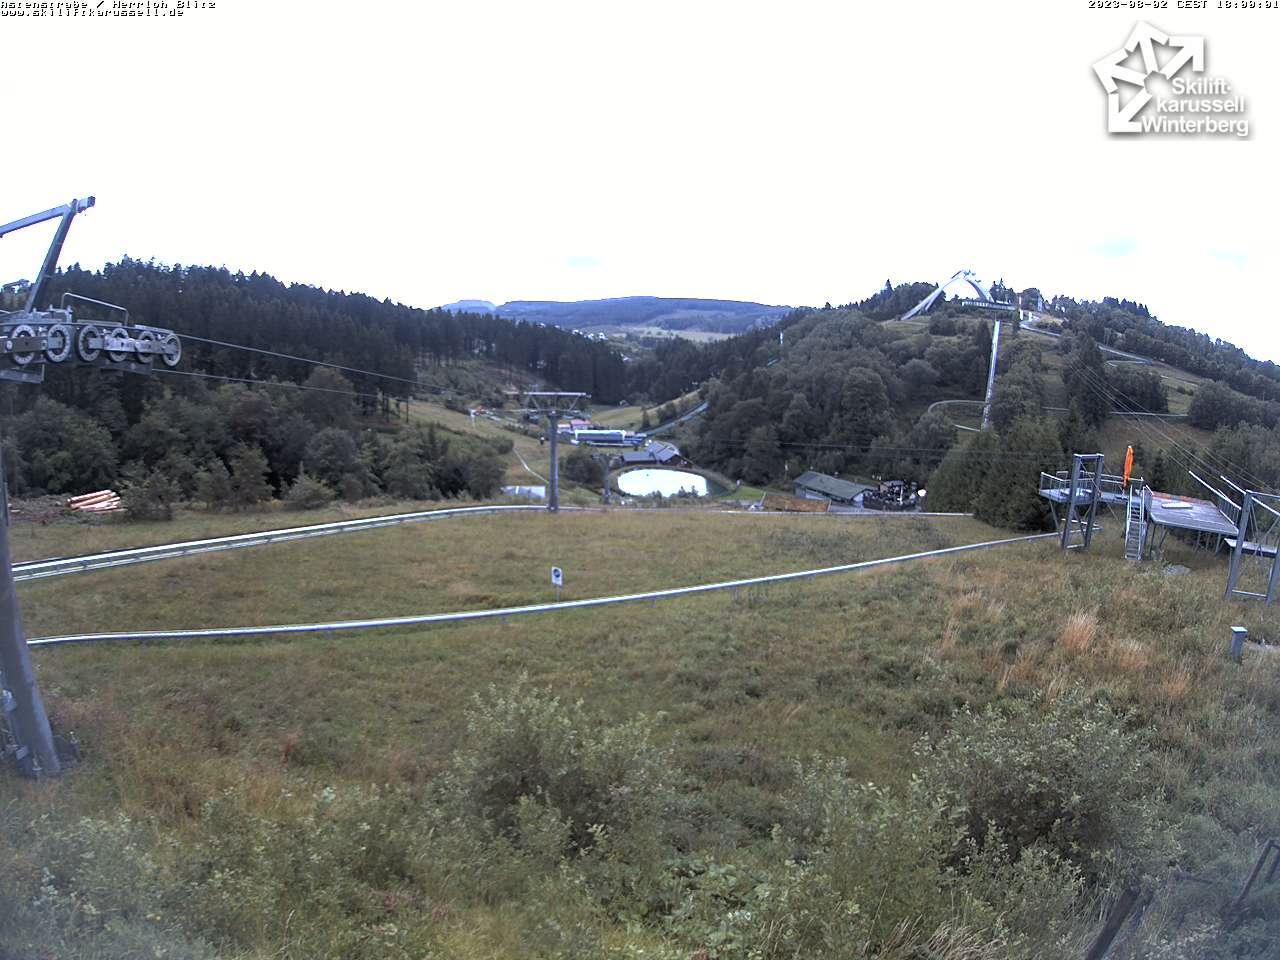 Webcam Winterberg - Skilift Astenstrasse